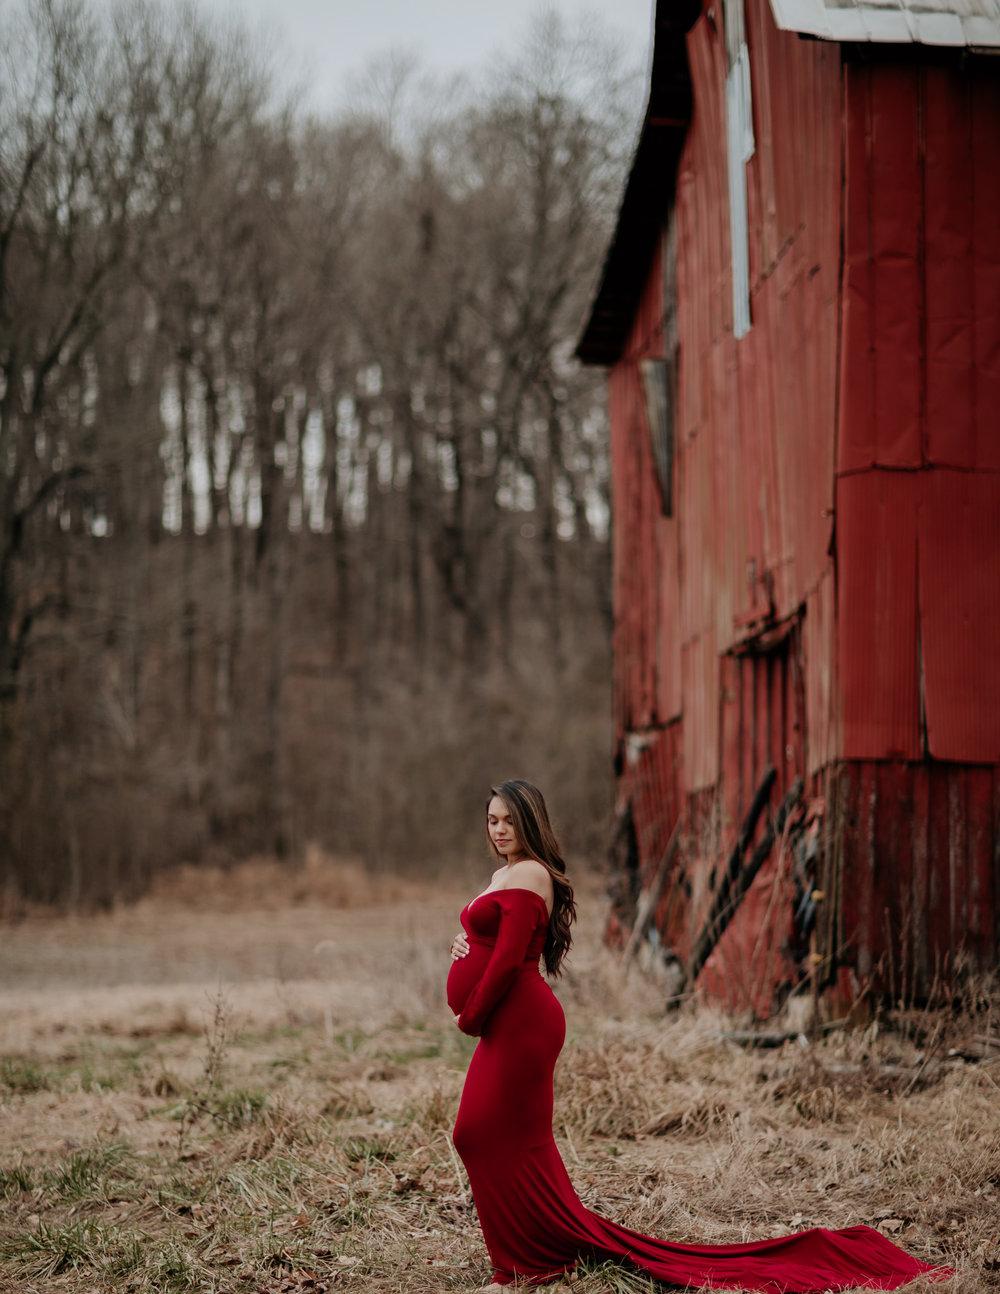 barn and maternity photo